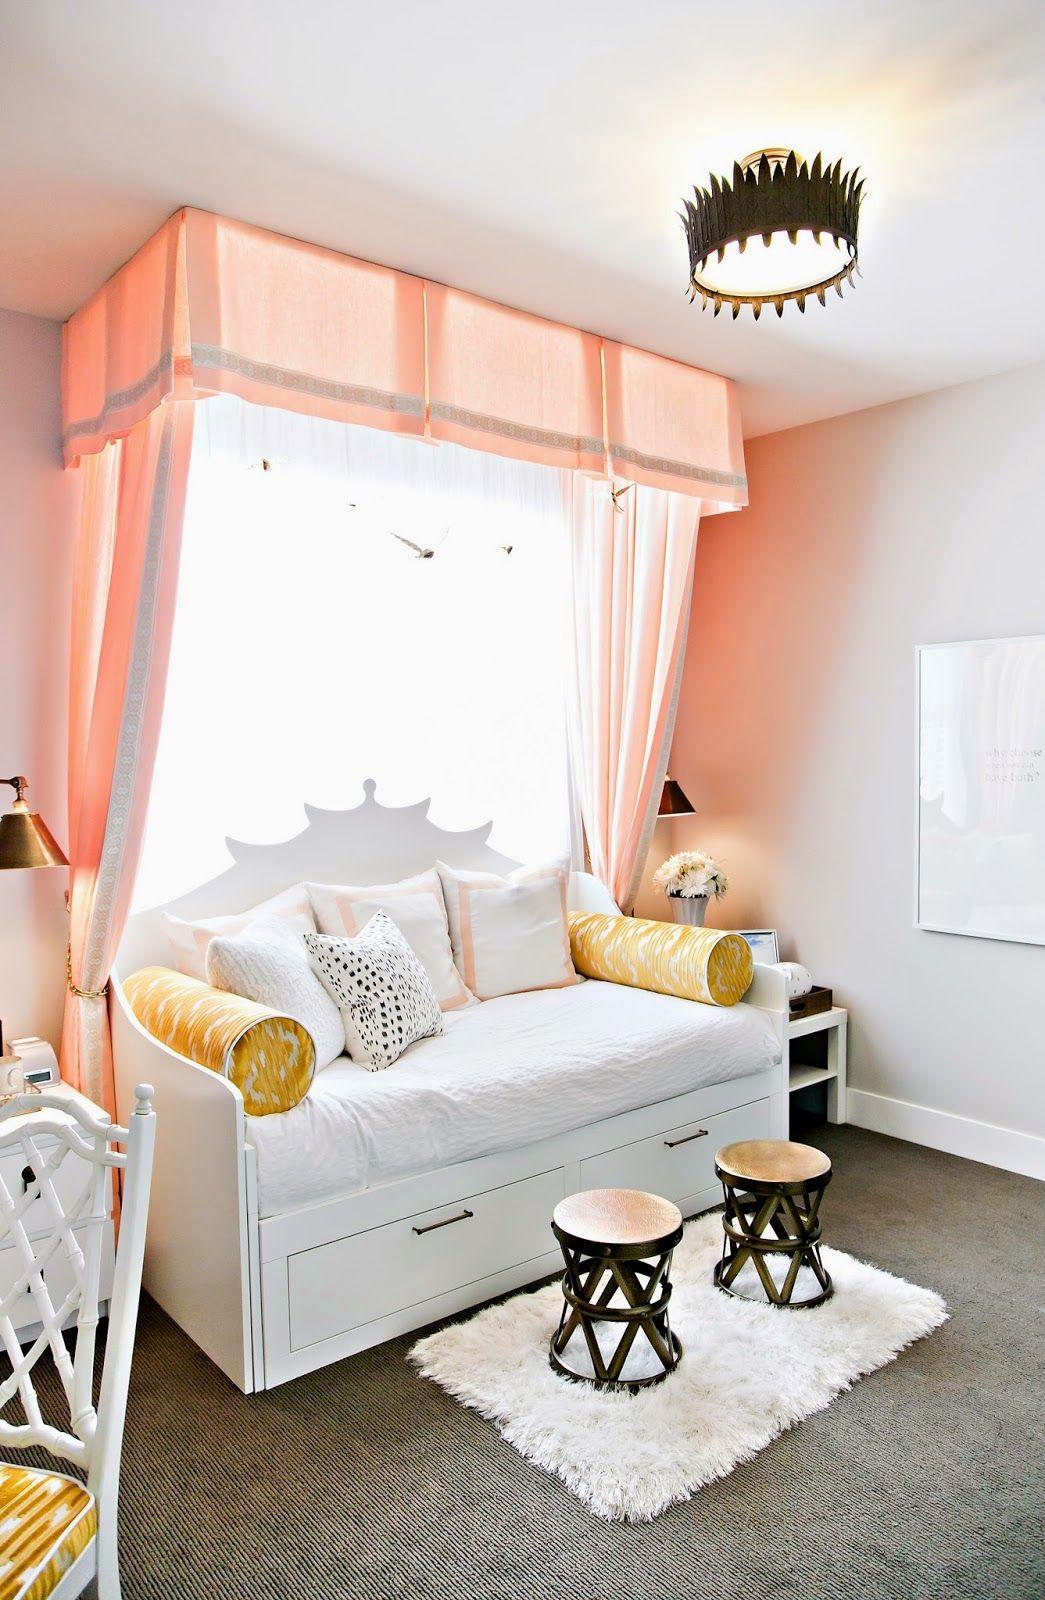 6ebc8e8ce8599458ece2204dd46530eb Inspirierend Teenager Schlafzimmer Designs Xzw1